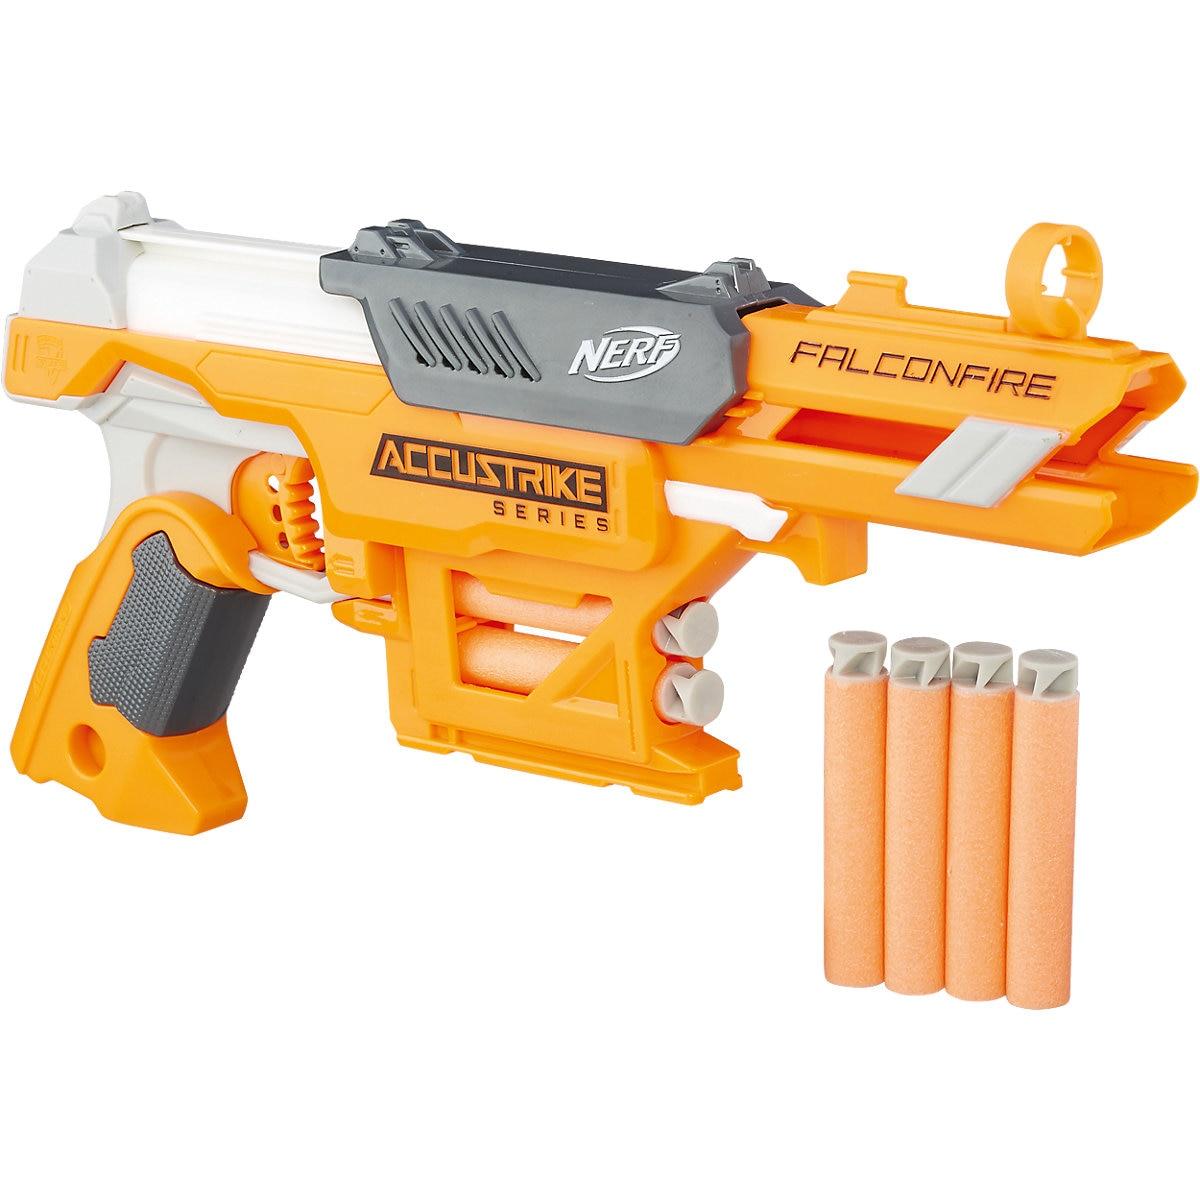 NERF Toy Guns 5104312 gun weapon toys games pneumatic blaster boy orbiz revolver Outdoor Fun Sports MTpromo